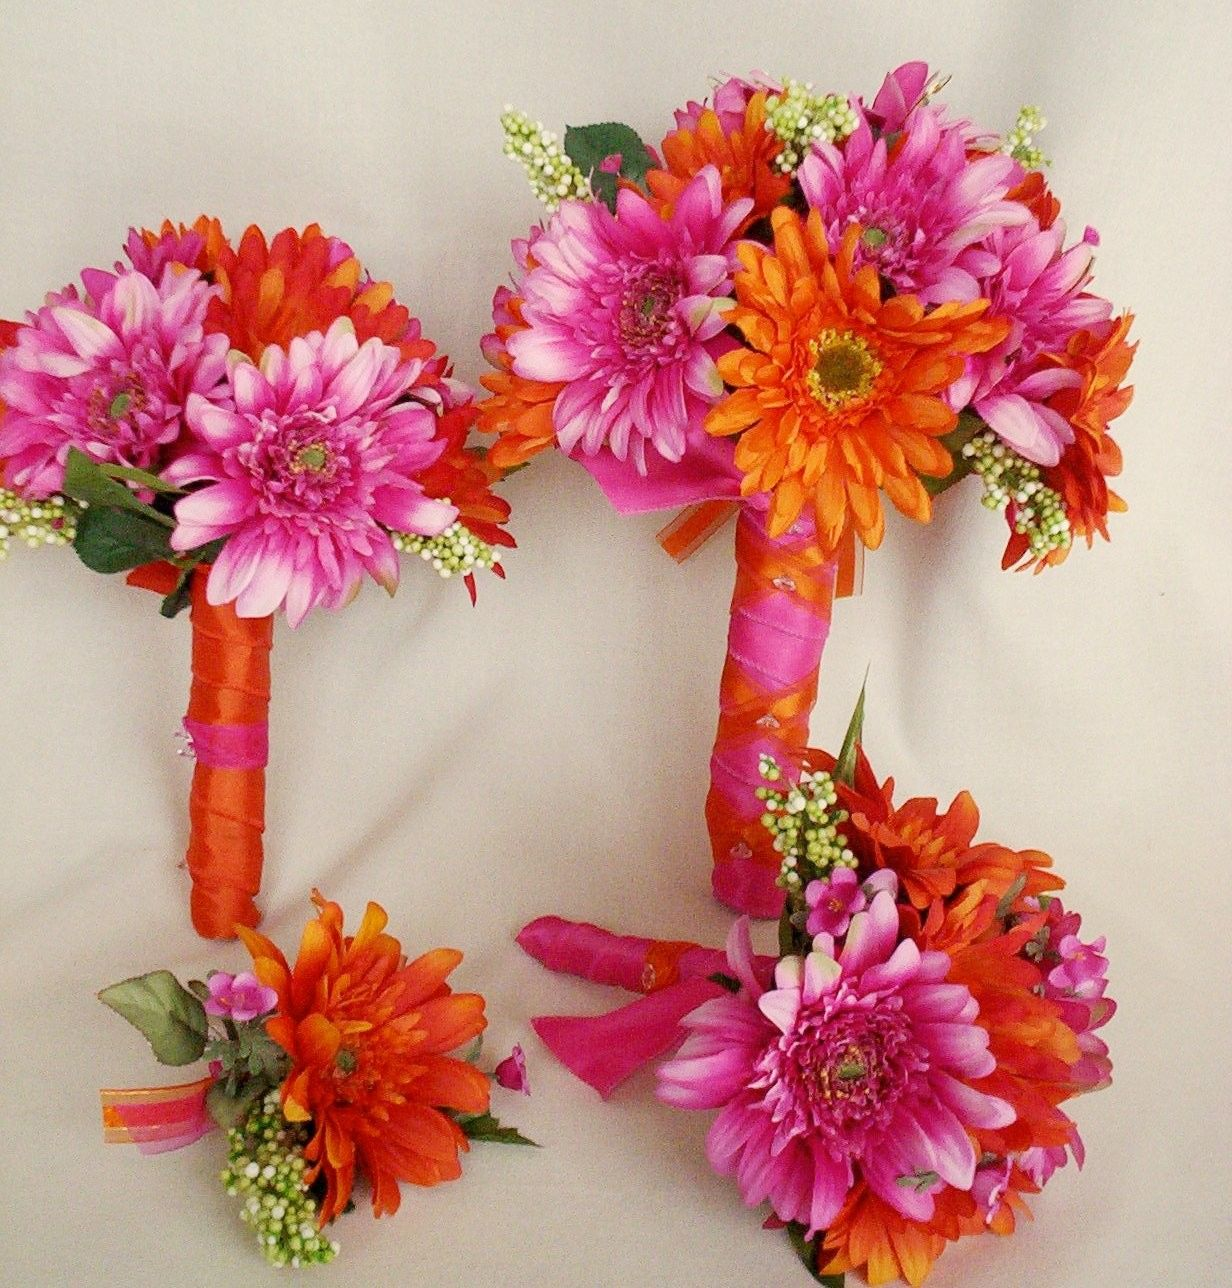 Silk bridal bouquets hot pink orange wedding flower package 12 silk bridal bouquets hot pink orange wedding flower package 12 pieces by amorebride orange fuschia gerbera dhlflorist Gallery